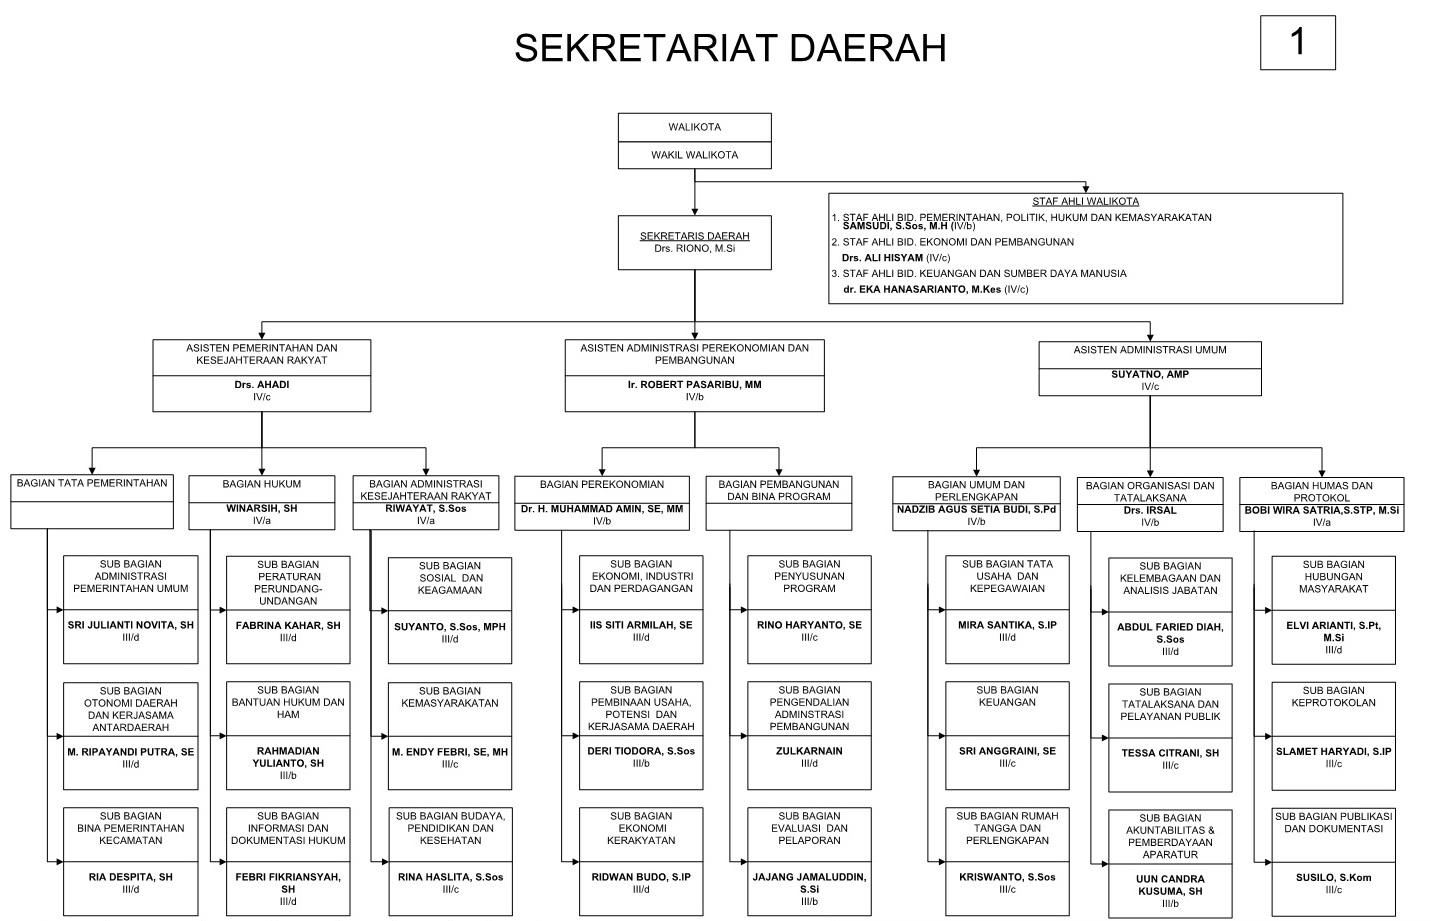 struktur organisasi sekretariat daerah kota tanjungpinang Struktur Organisasi Kemenkes judul, struktur organisasi sekretariat